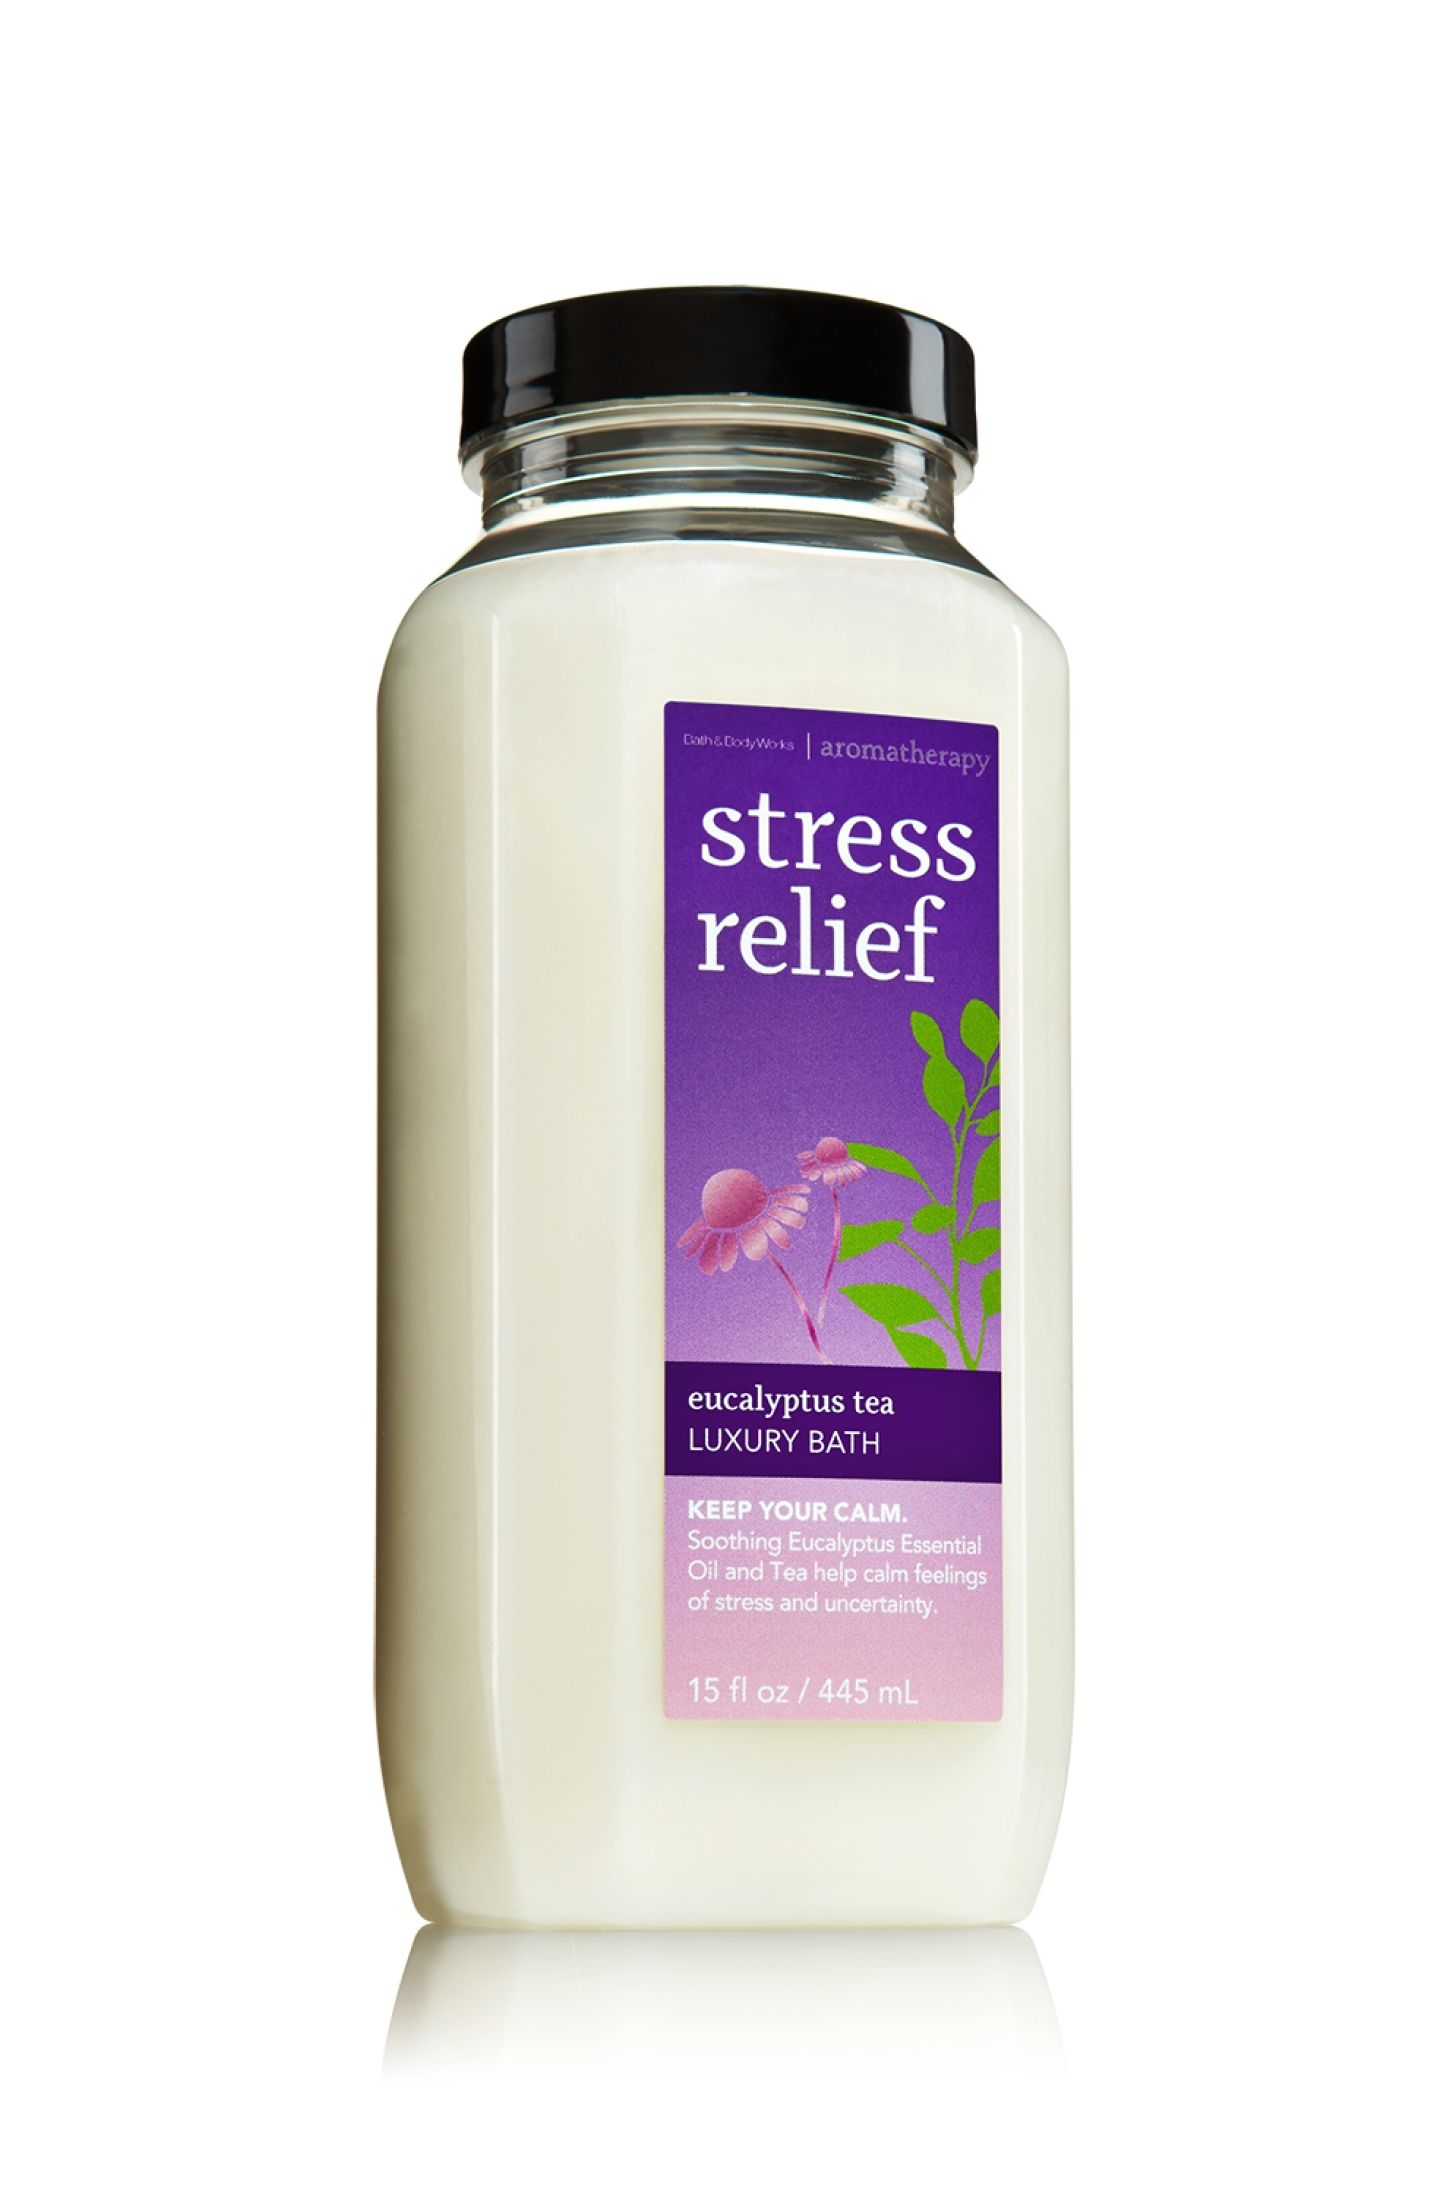 Pocketbac Sanitizing Hand Gel Stress Relief Eucalyptus Spearmint